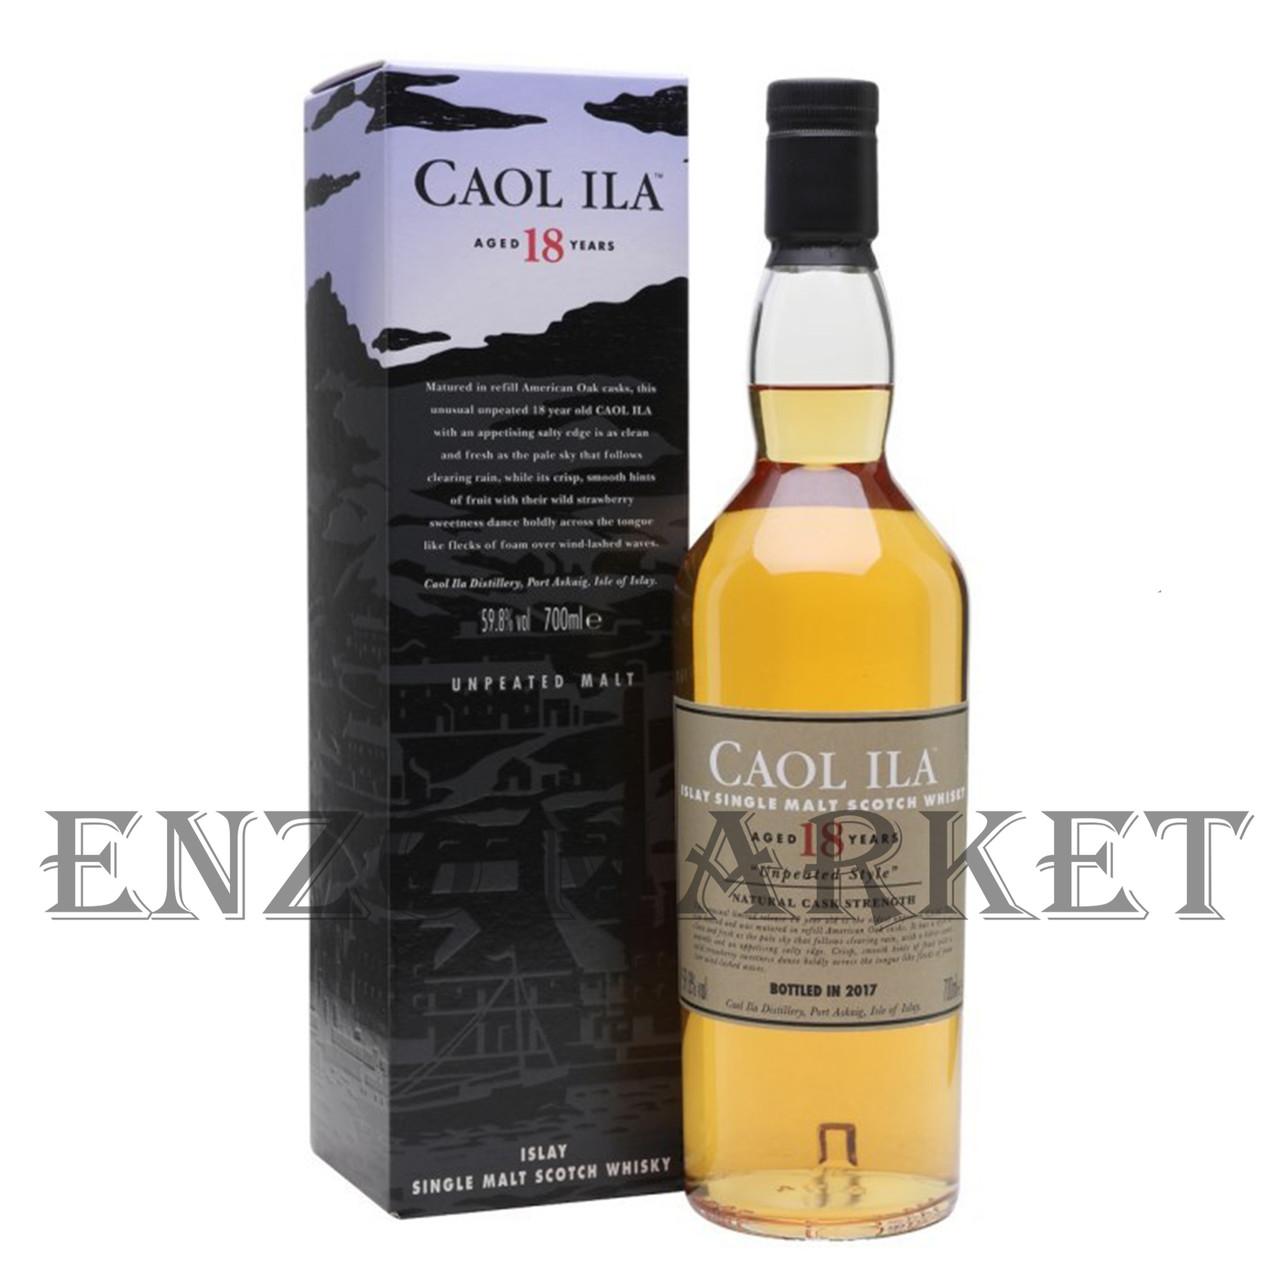 Виски Caol Ila 18 y.o. Unpeated Special Release (Каол Ила 18 лет Спешл Релиз) 59.8%, 0,7 литра